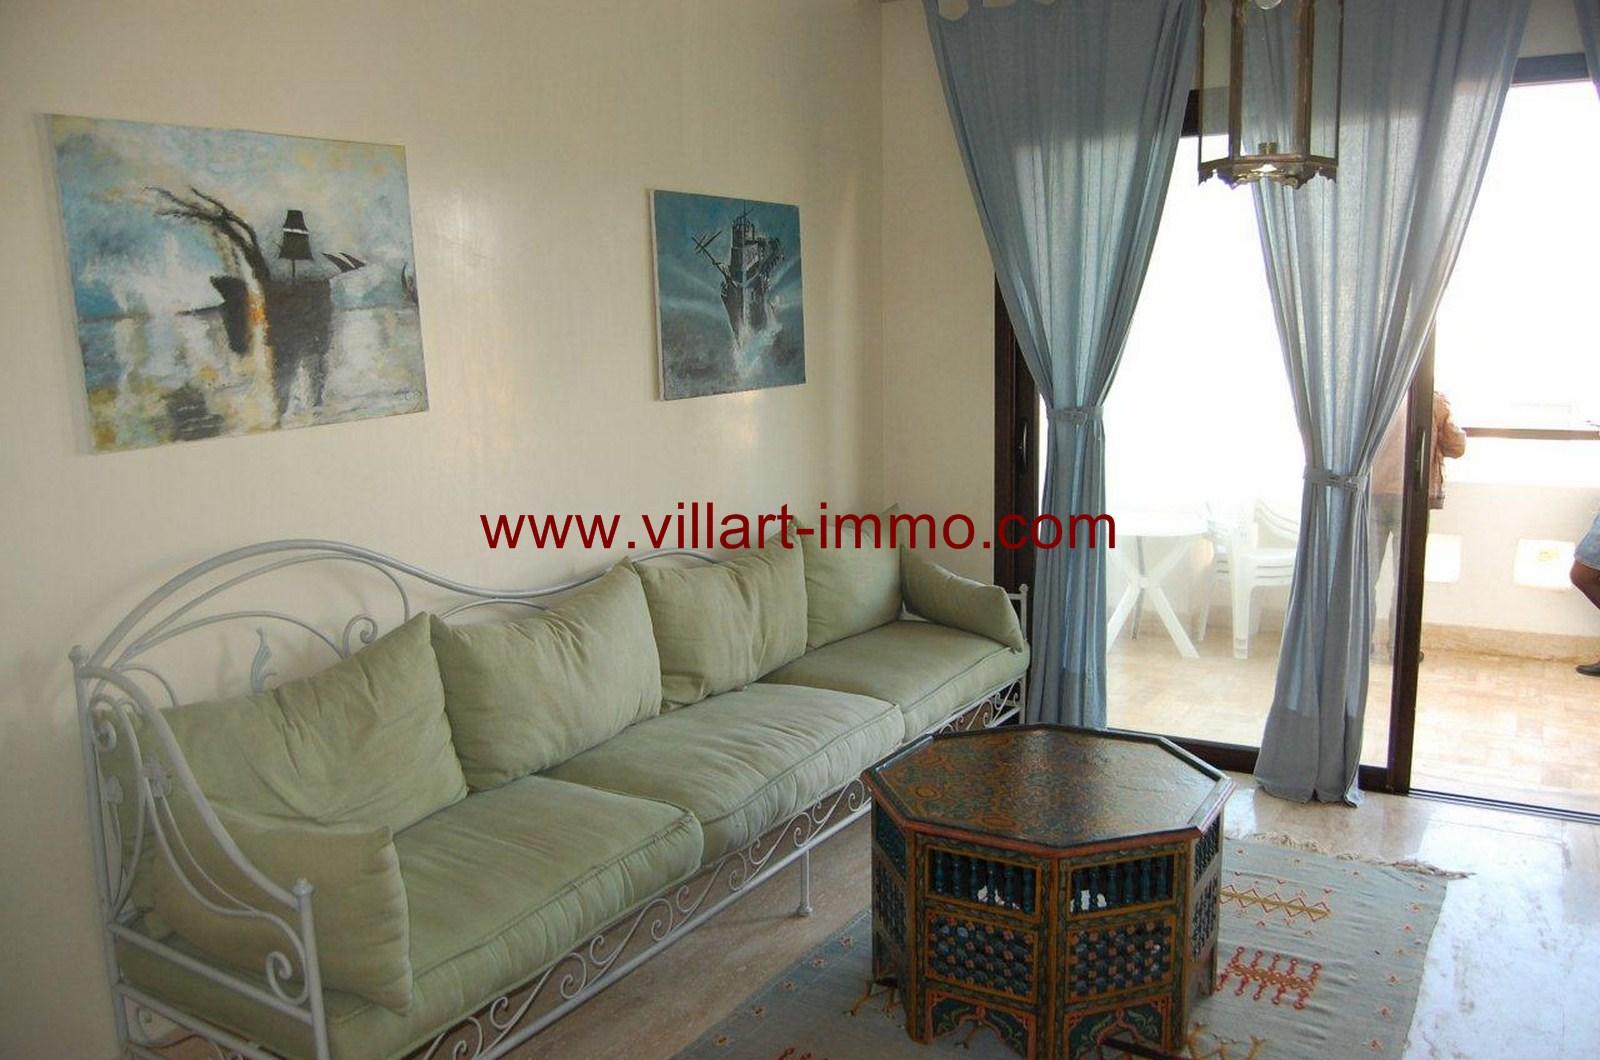 2-vente-appartement-tanger-achakar-salon-1-va389-villart-immo